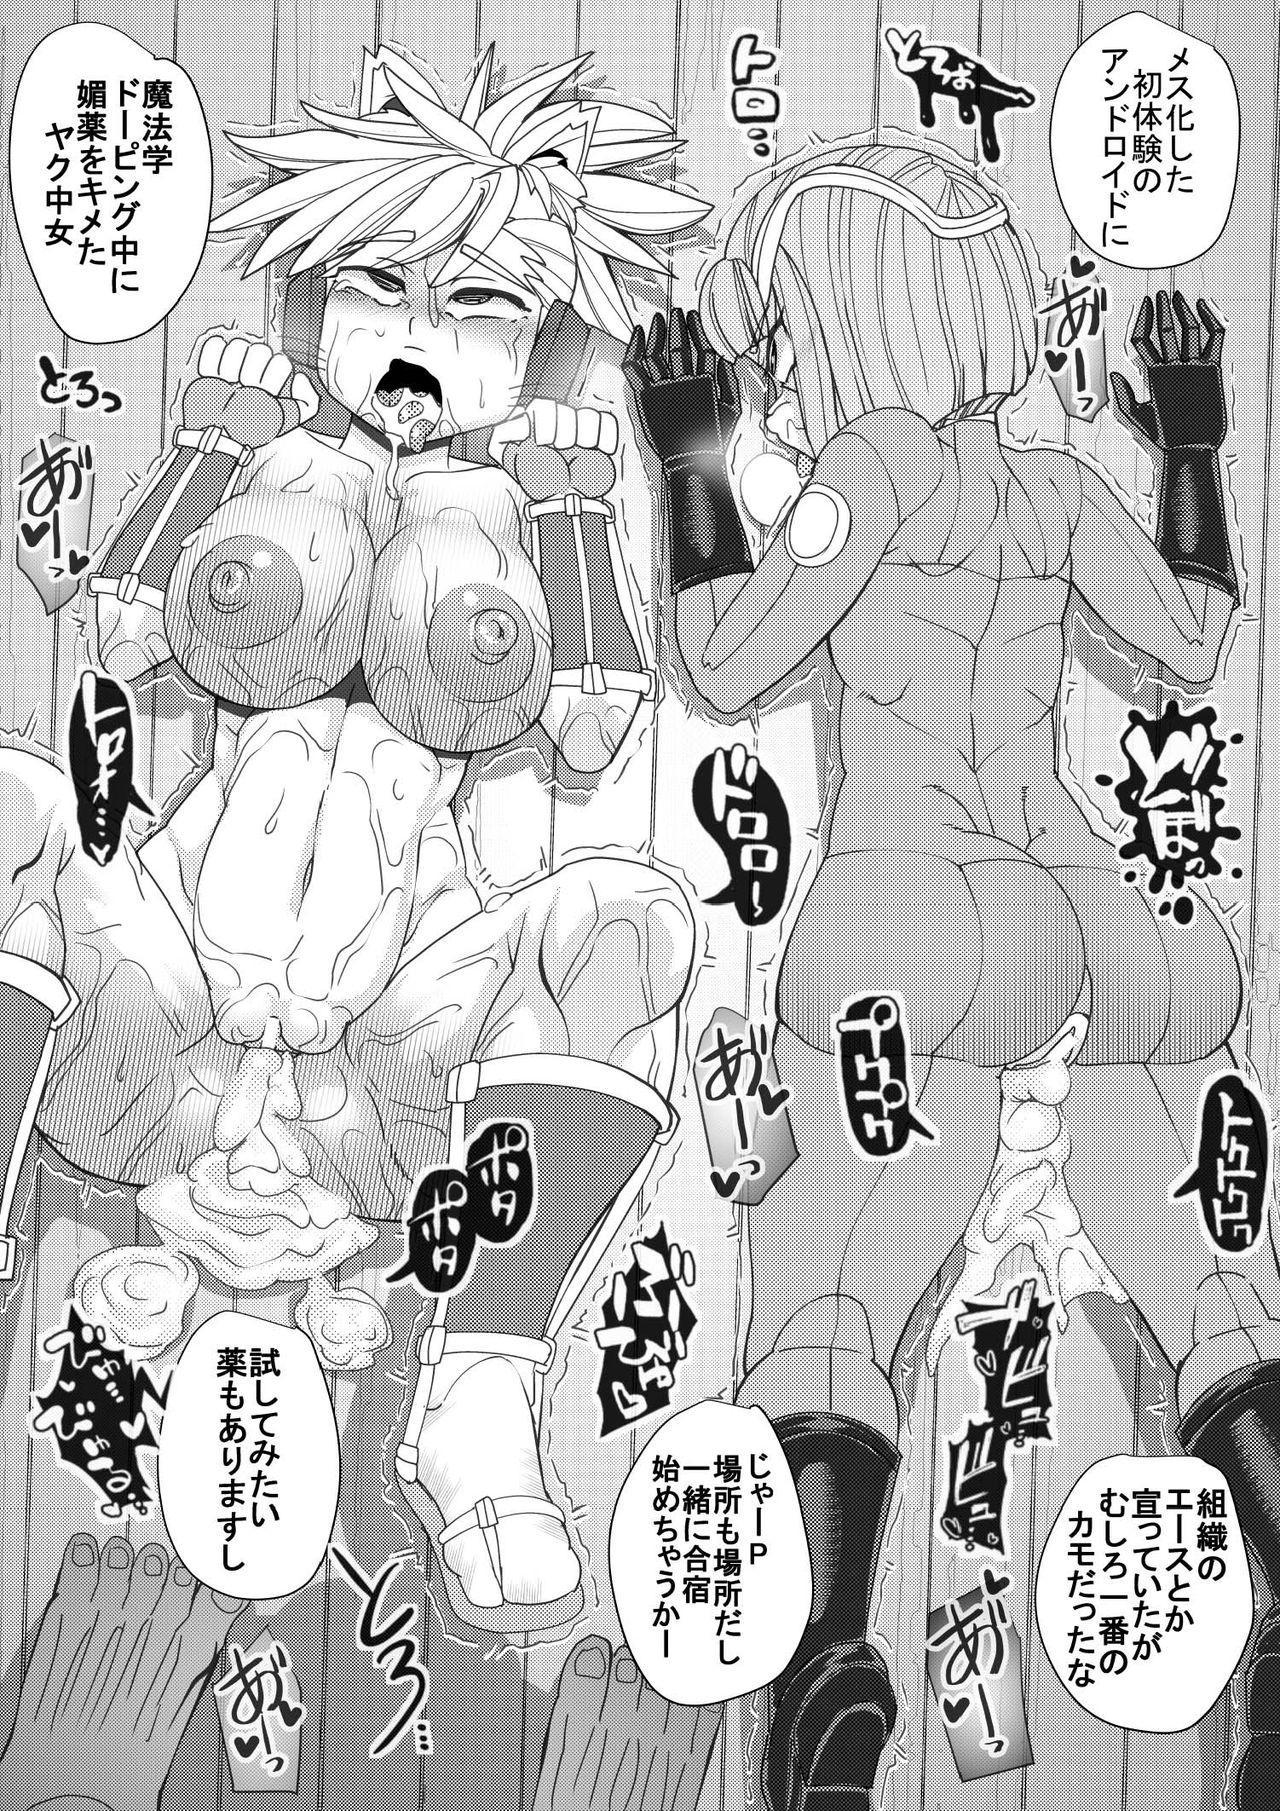 Haramachi 8 18